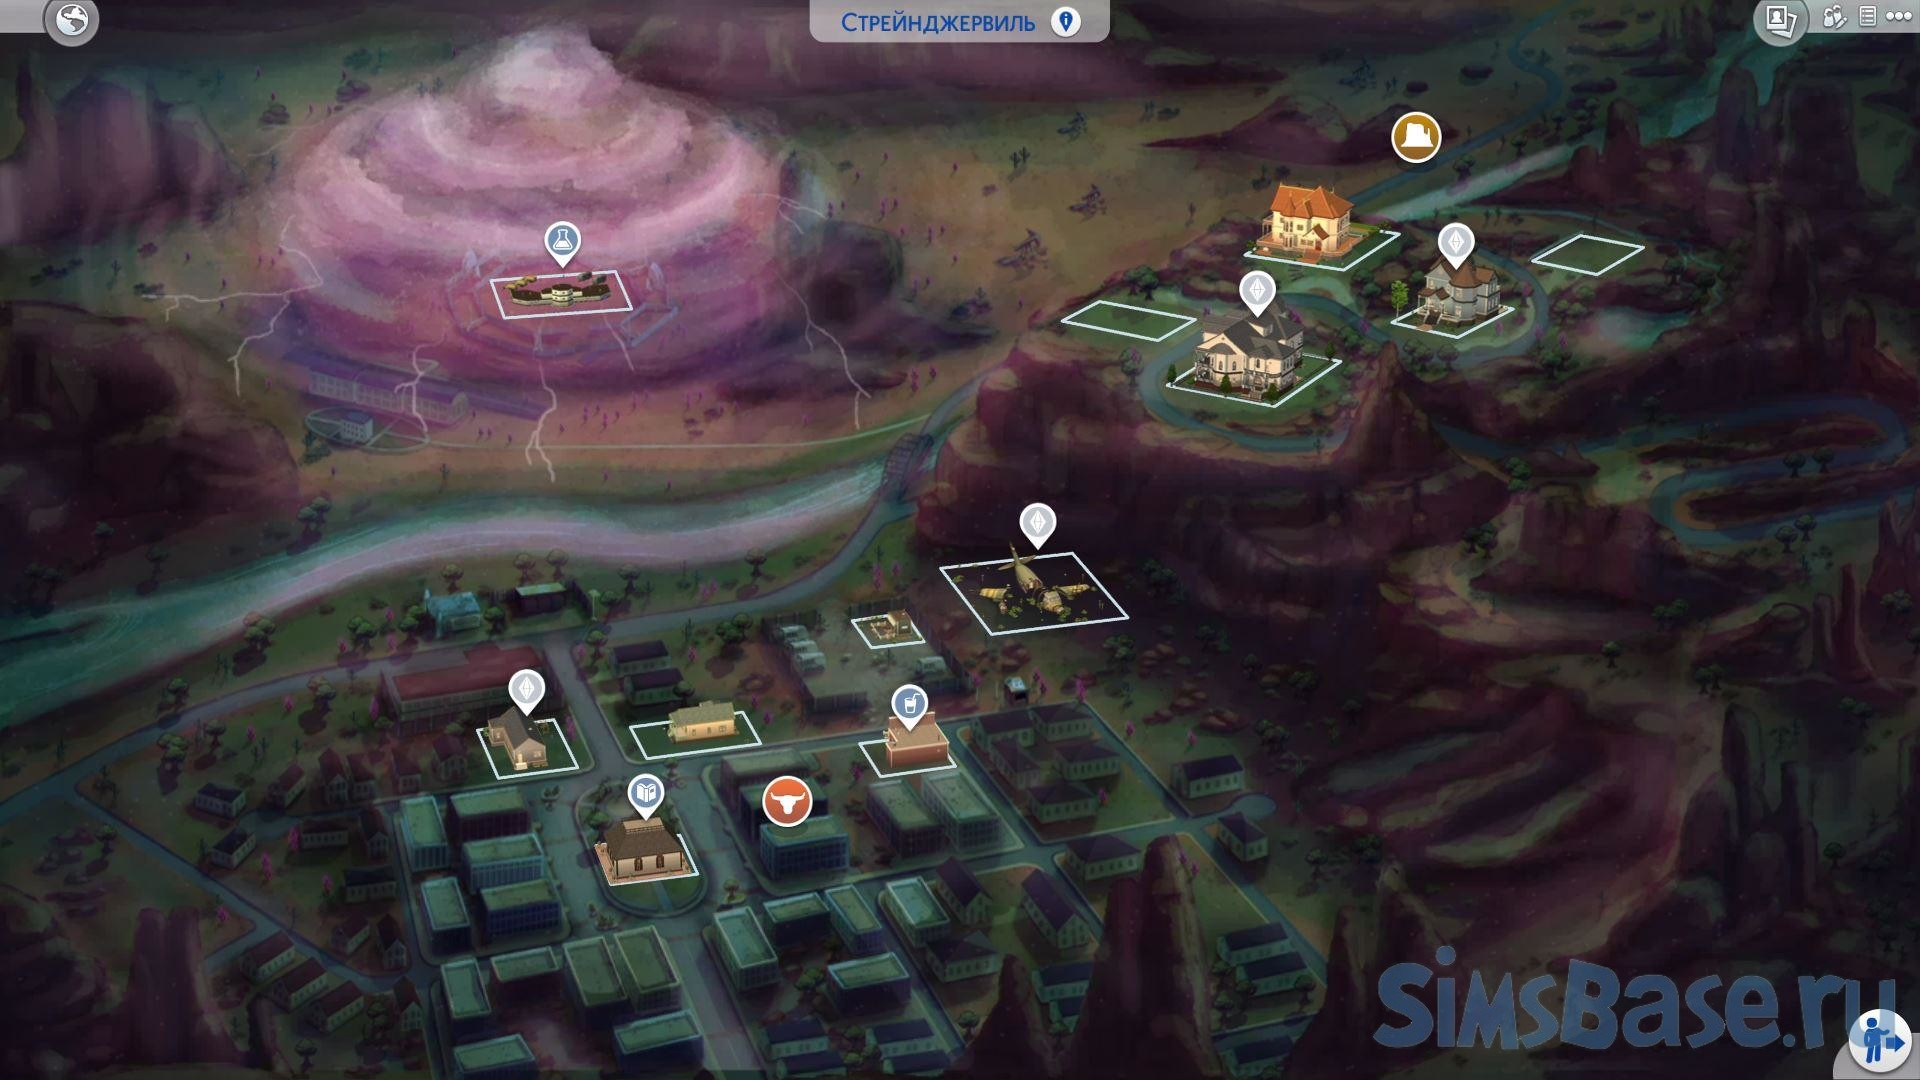 Мод «Перерисовка карты Стрейнджервиля» от DerShayan для Sims 4